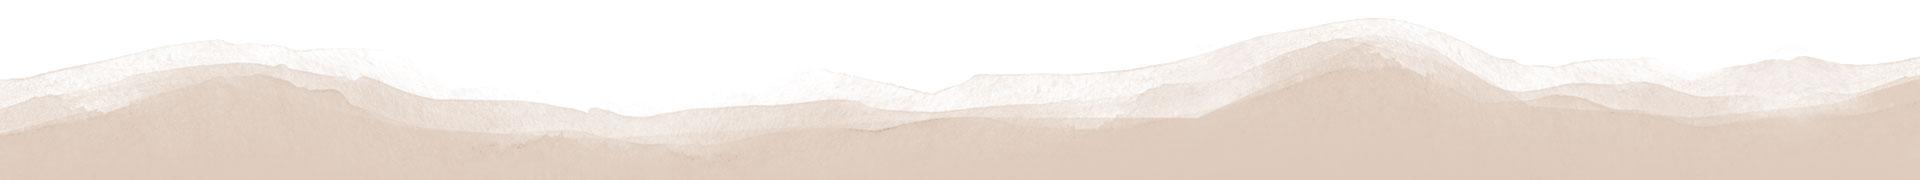 Clearwater-Farm-Divider-Organic-Dairy-Vanilla.jpg